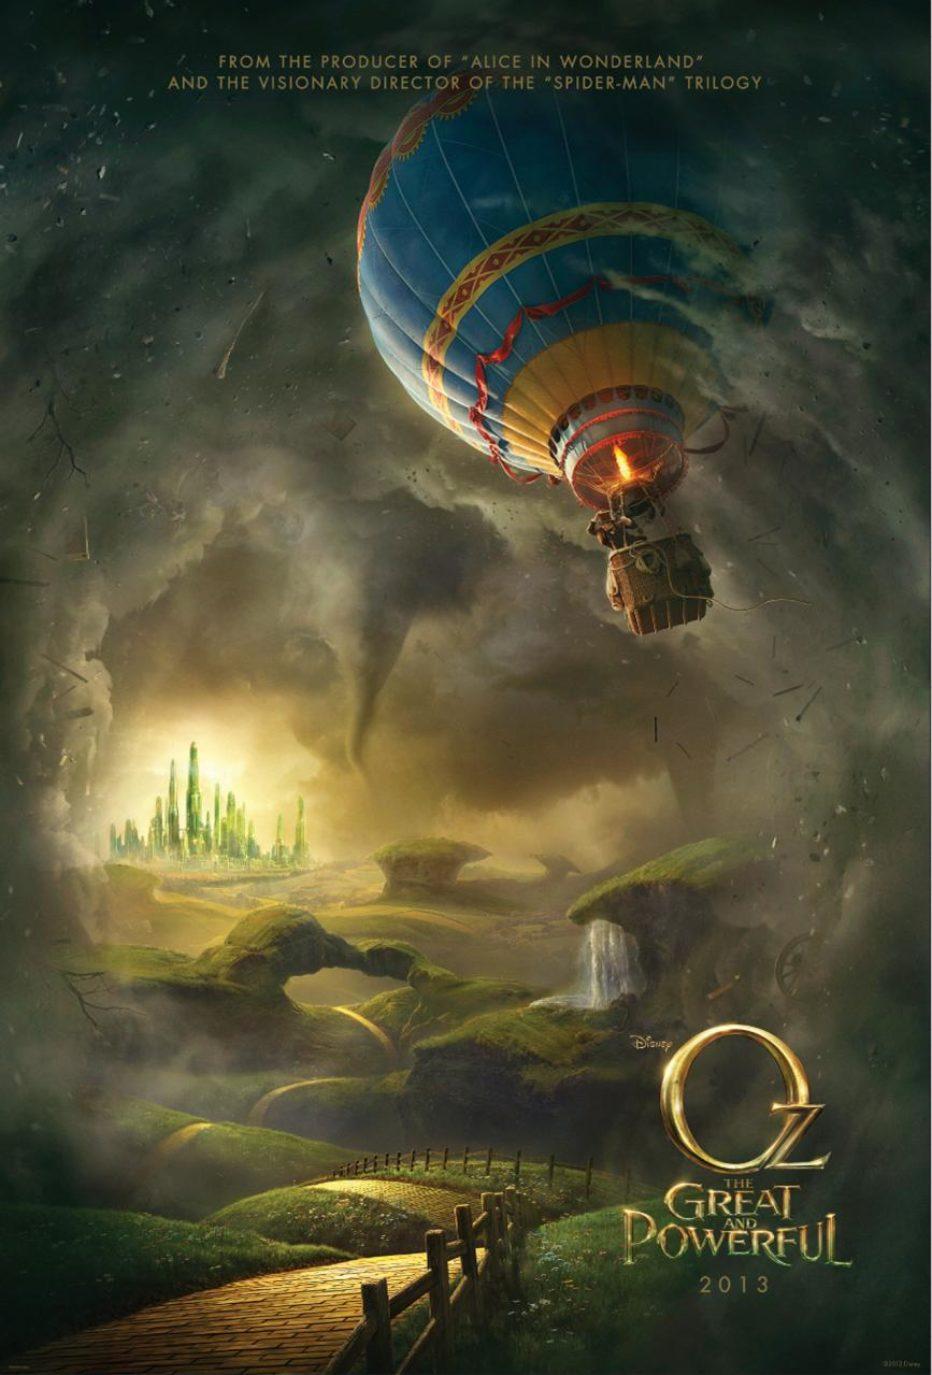 Tweets del día: Oz The great and Powerful